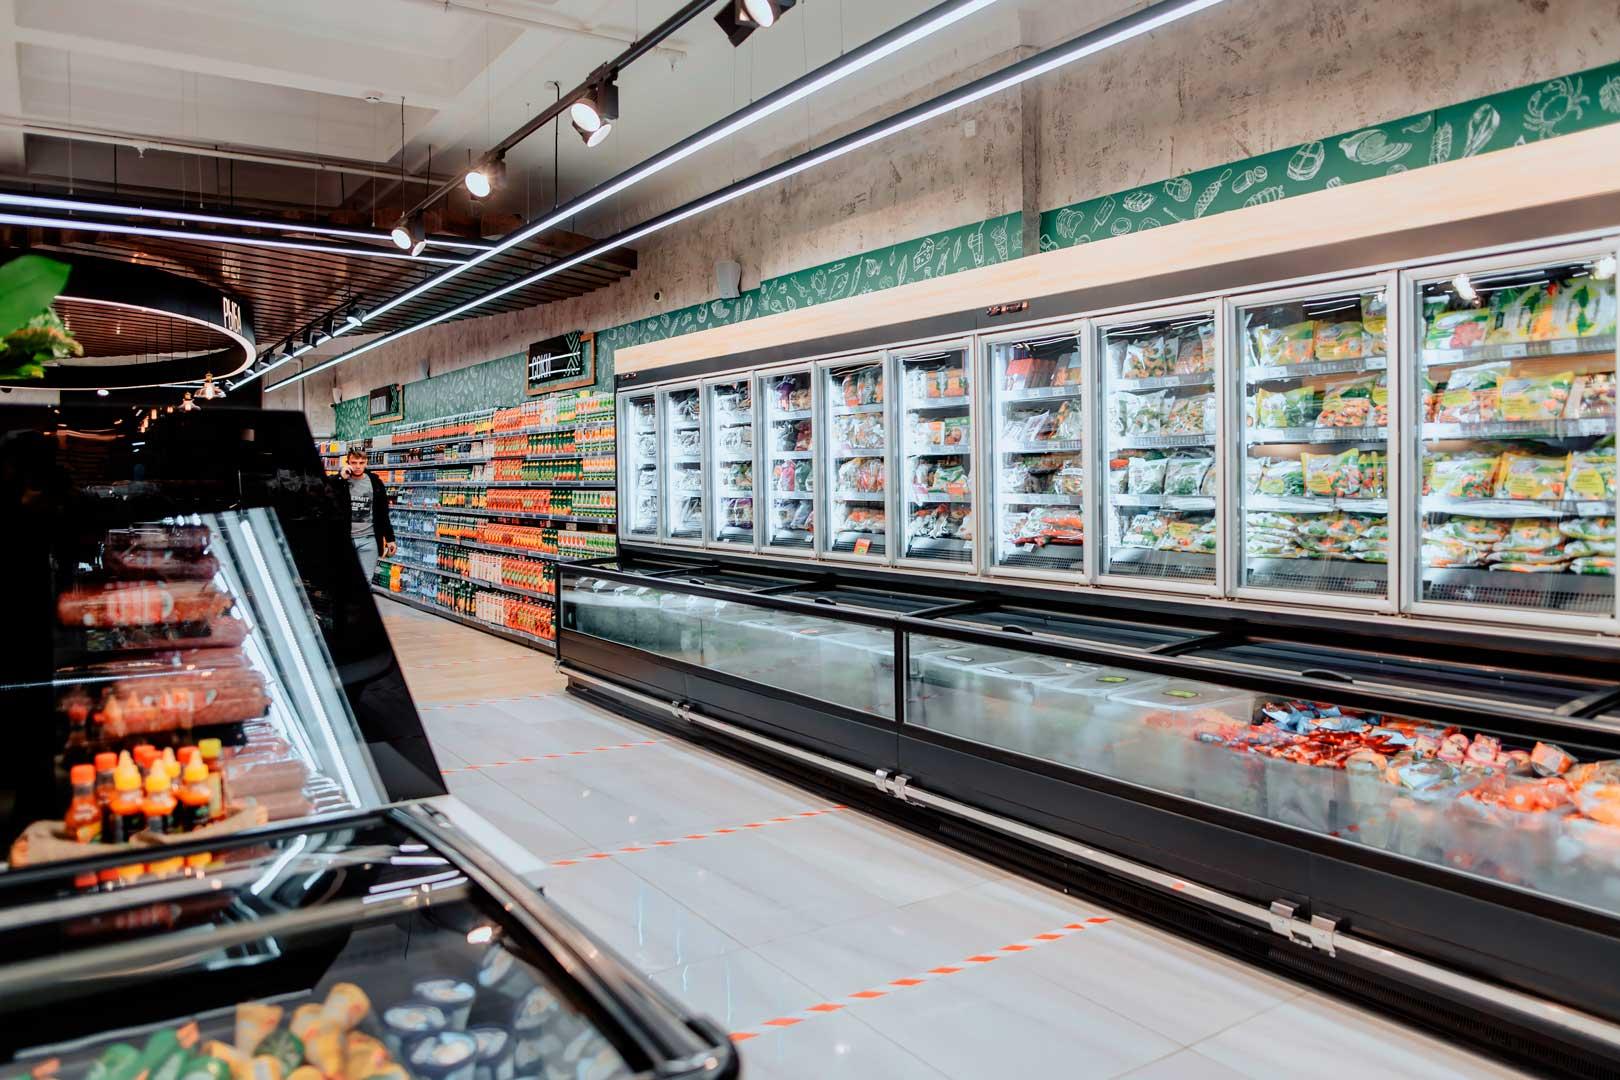 Frozen foods units Alaska combi MHV 110 LT DC M